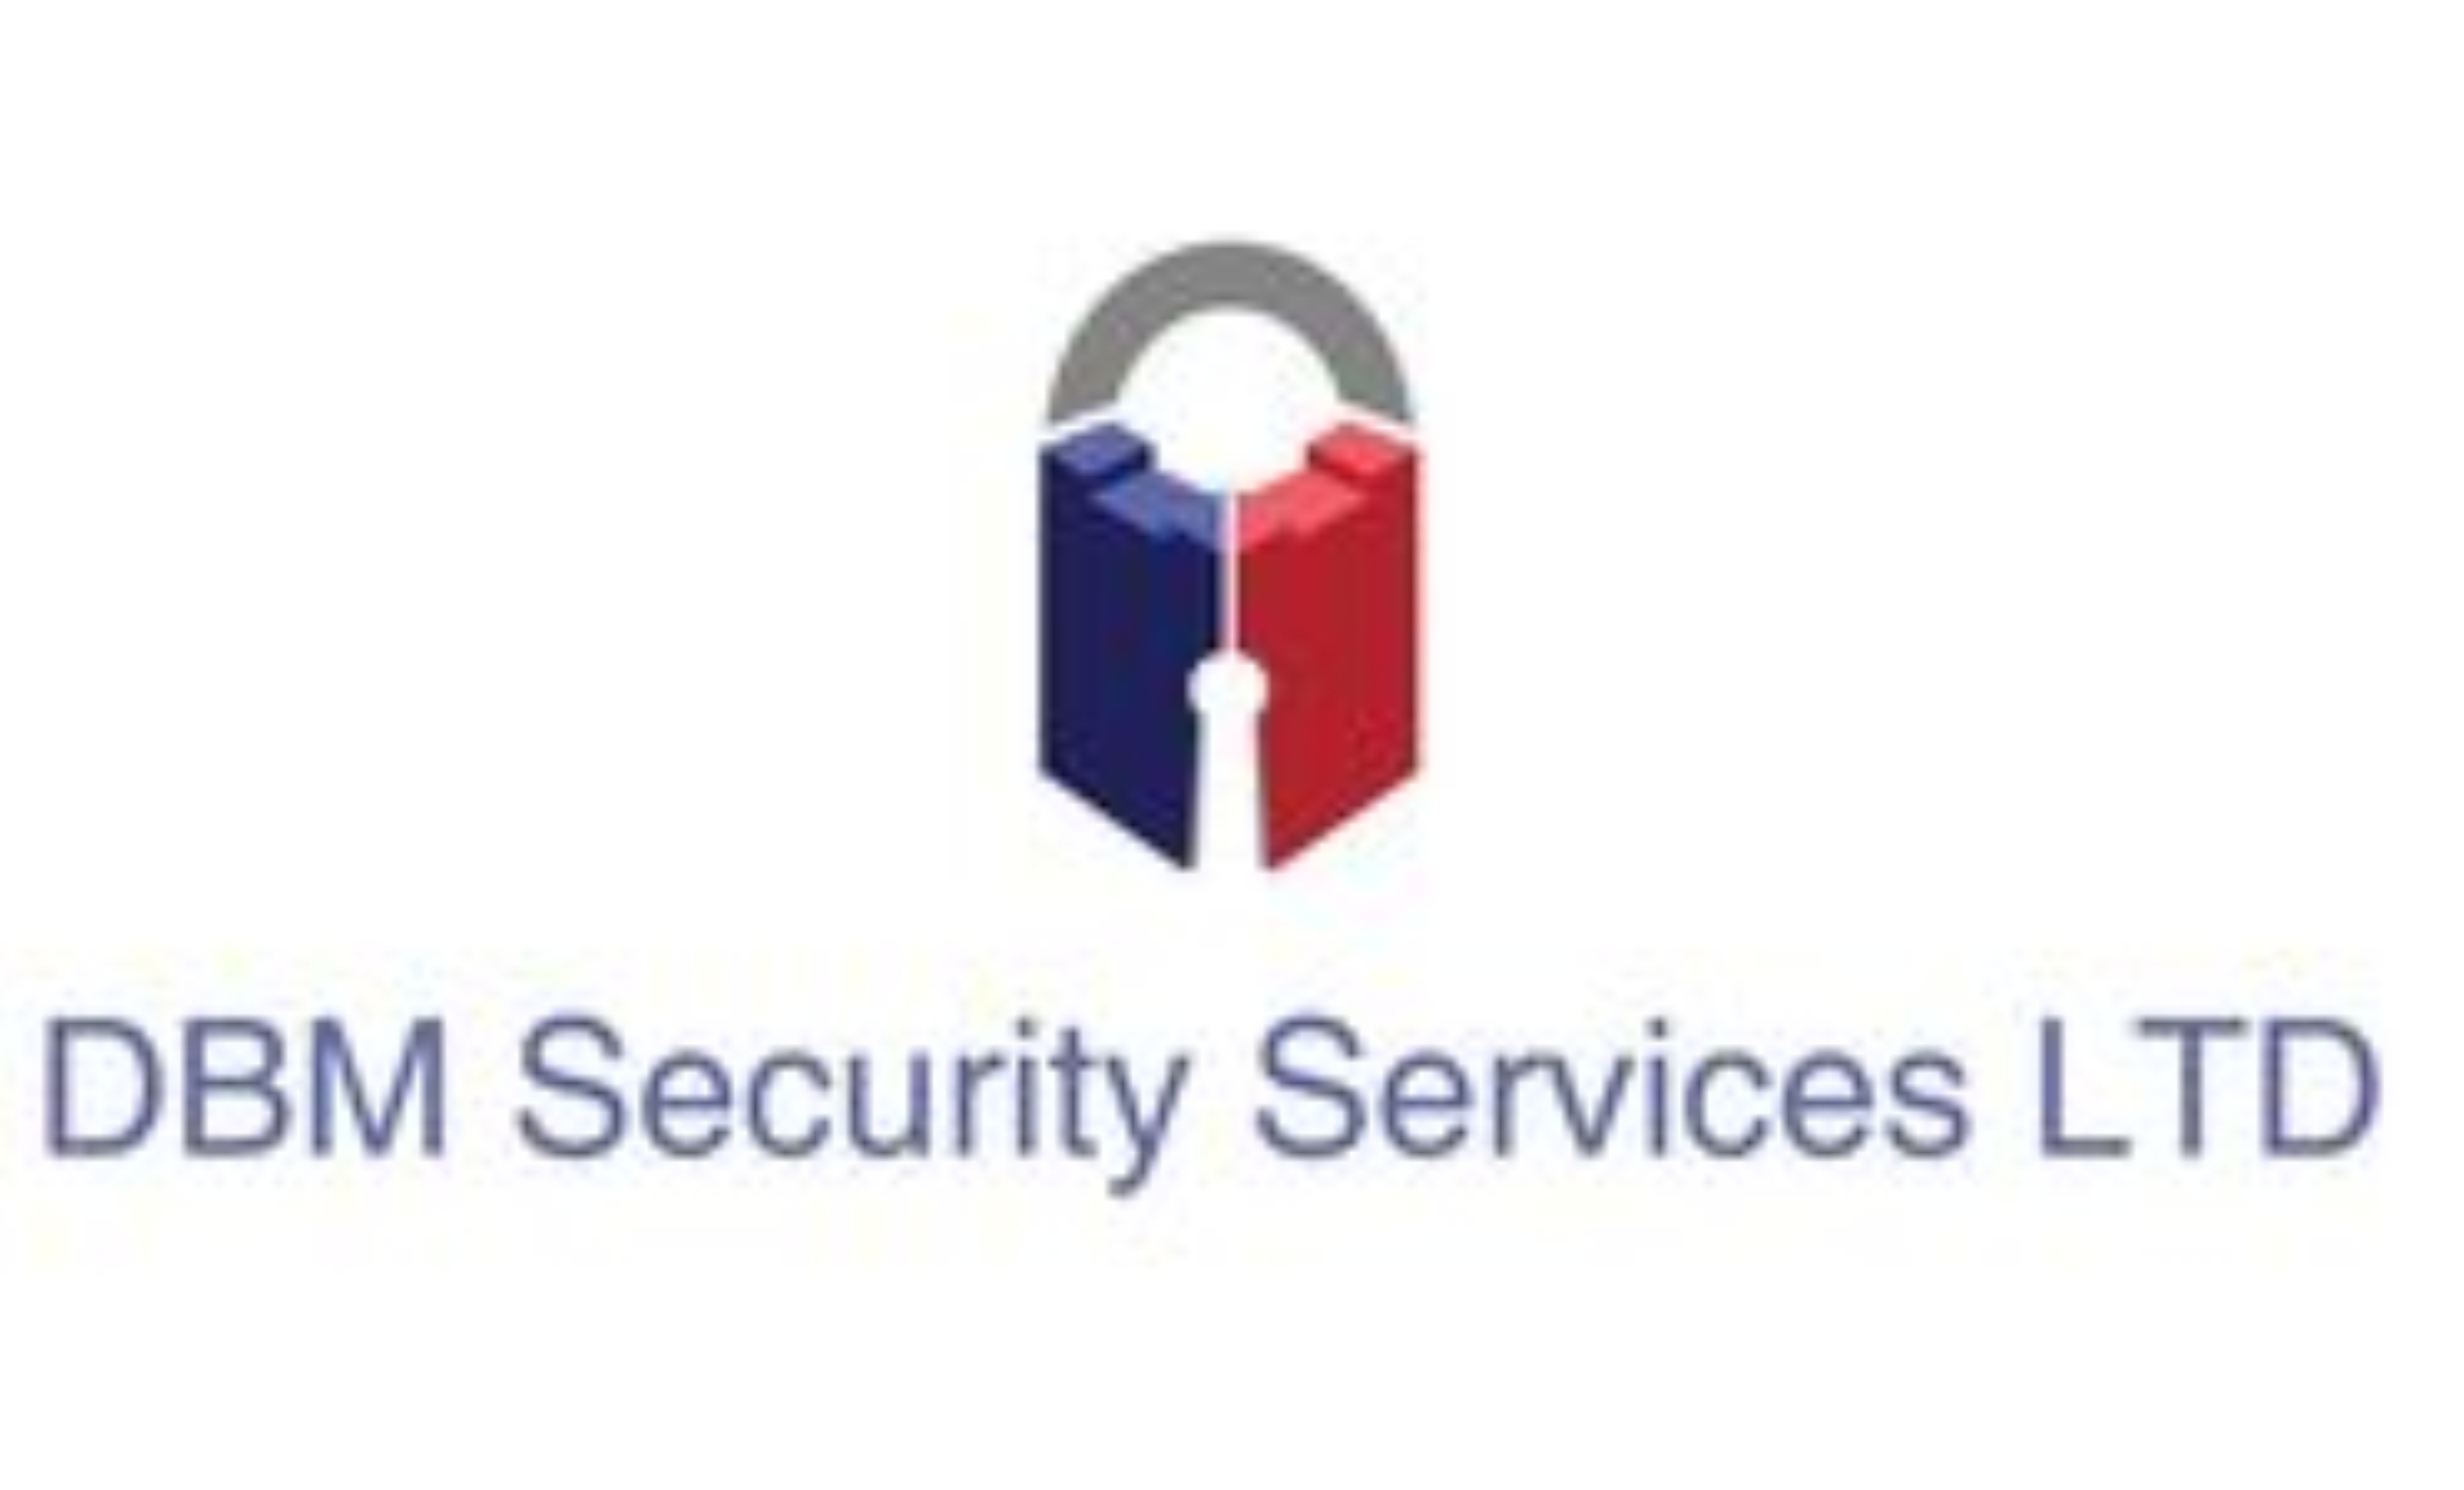 DBM Security Services Ltd